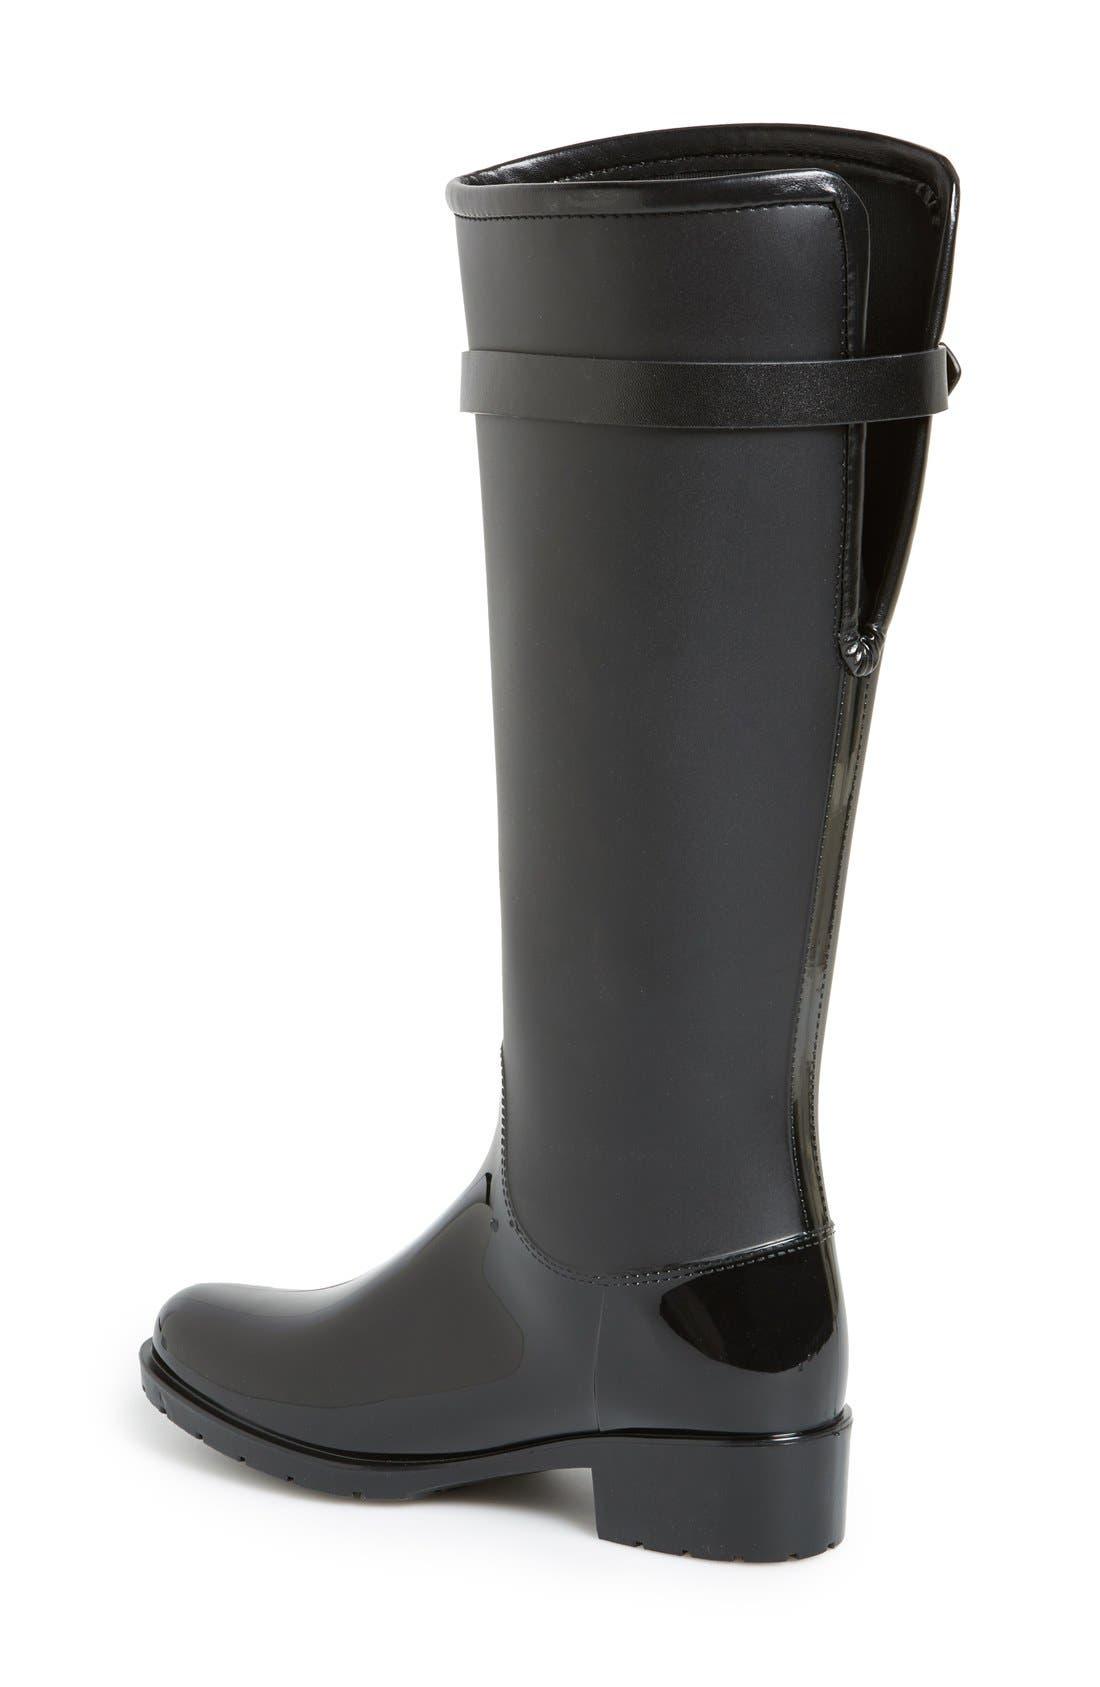 Alternate Image 2  - däv 'Lisbon' Weatherproof Knee High Rain Boot (Women)